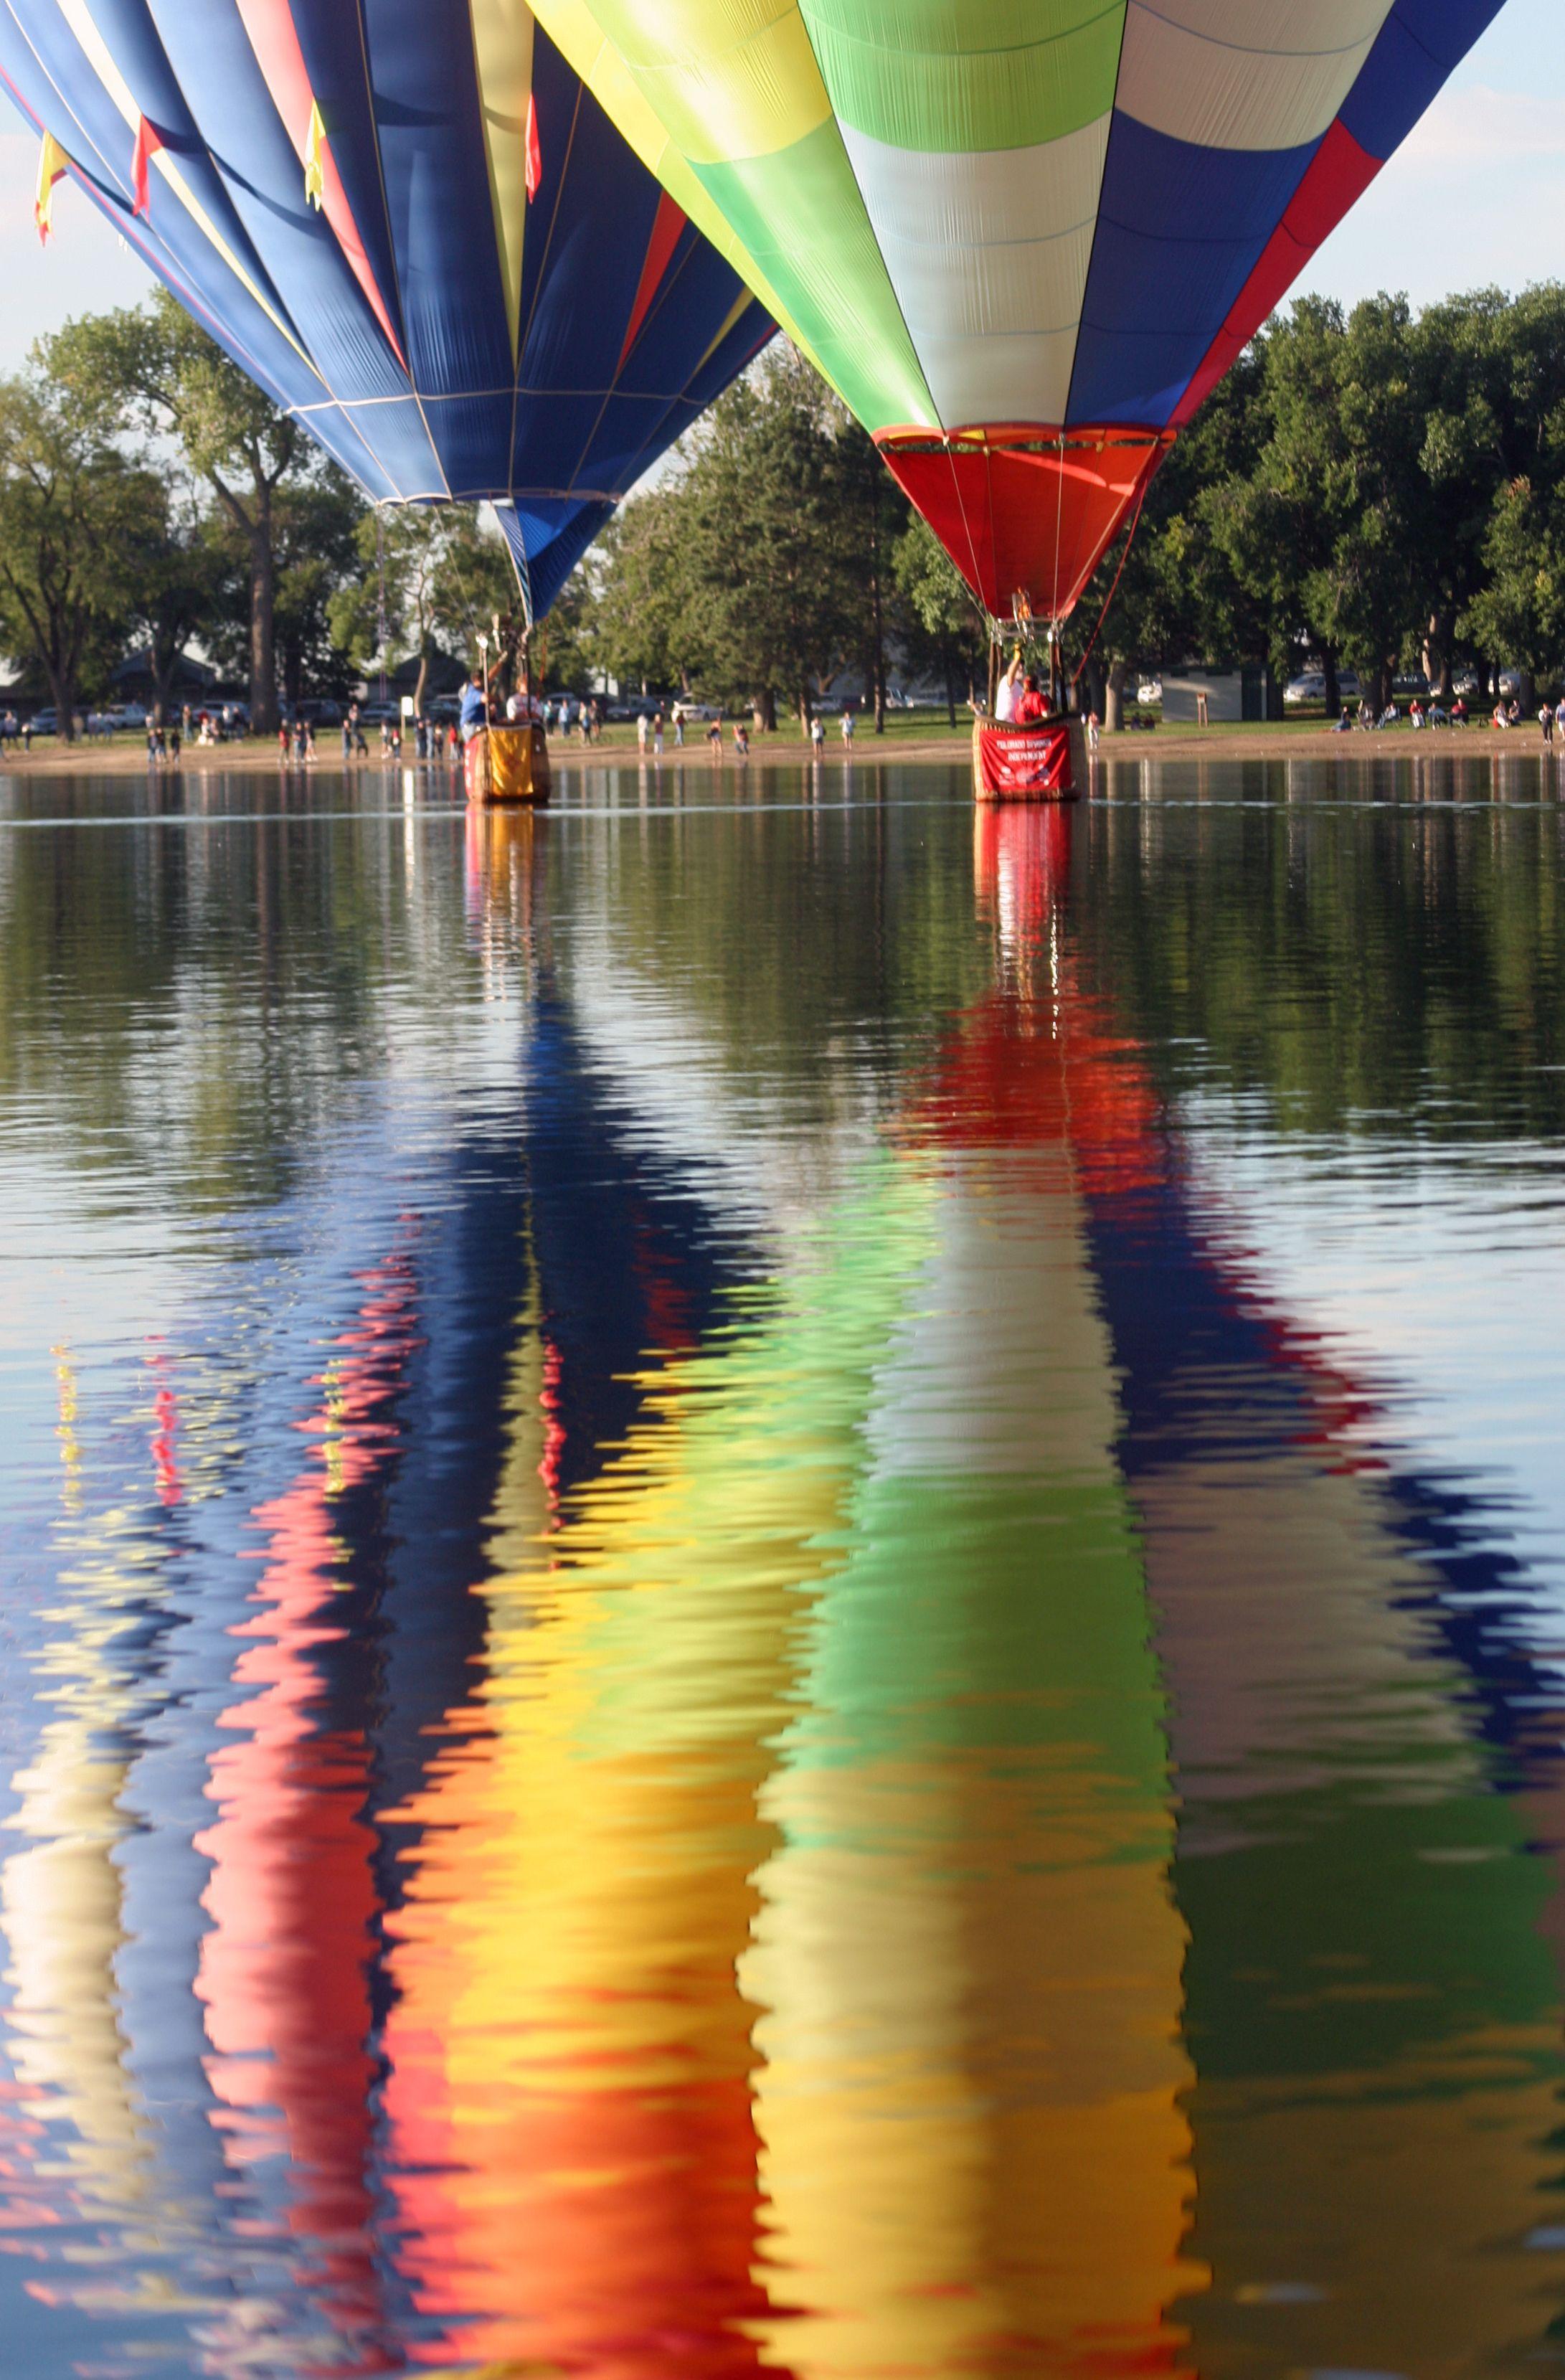 Colorado balloon classic in colorado springs labor day